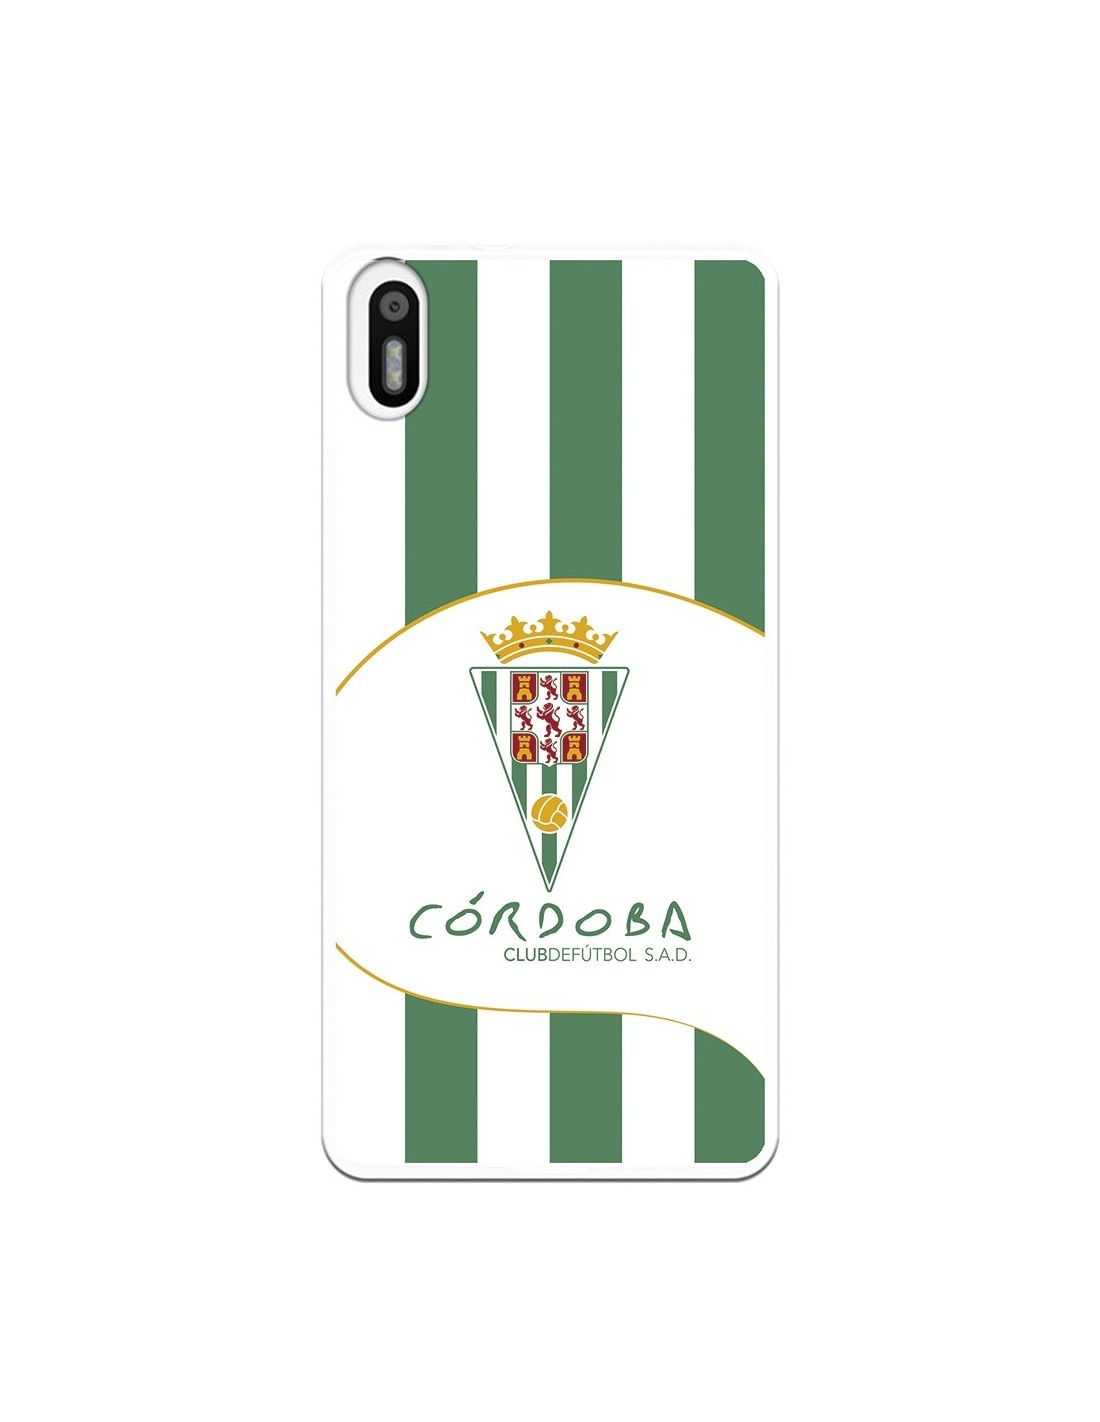 Bq Aquaris X5 Córdoba CF grün und weiß stripes abdeckung fall-Córdoba CF offizielle lizenz